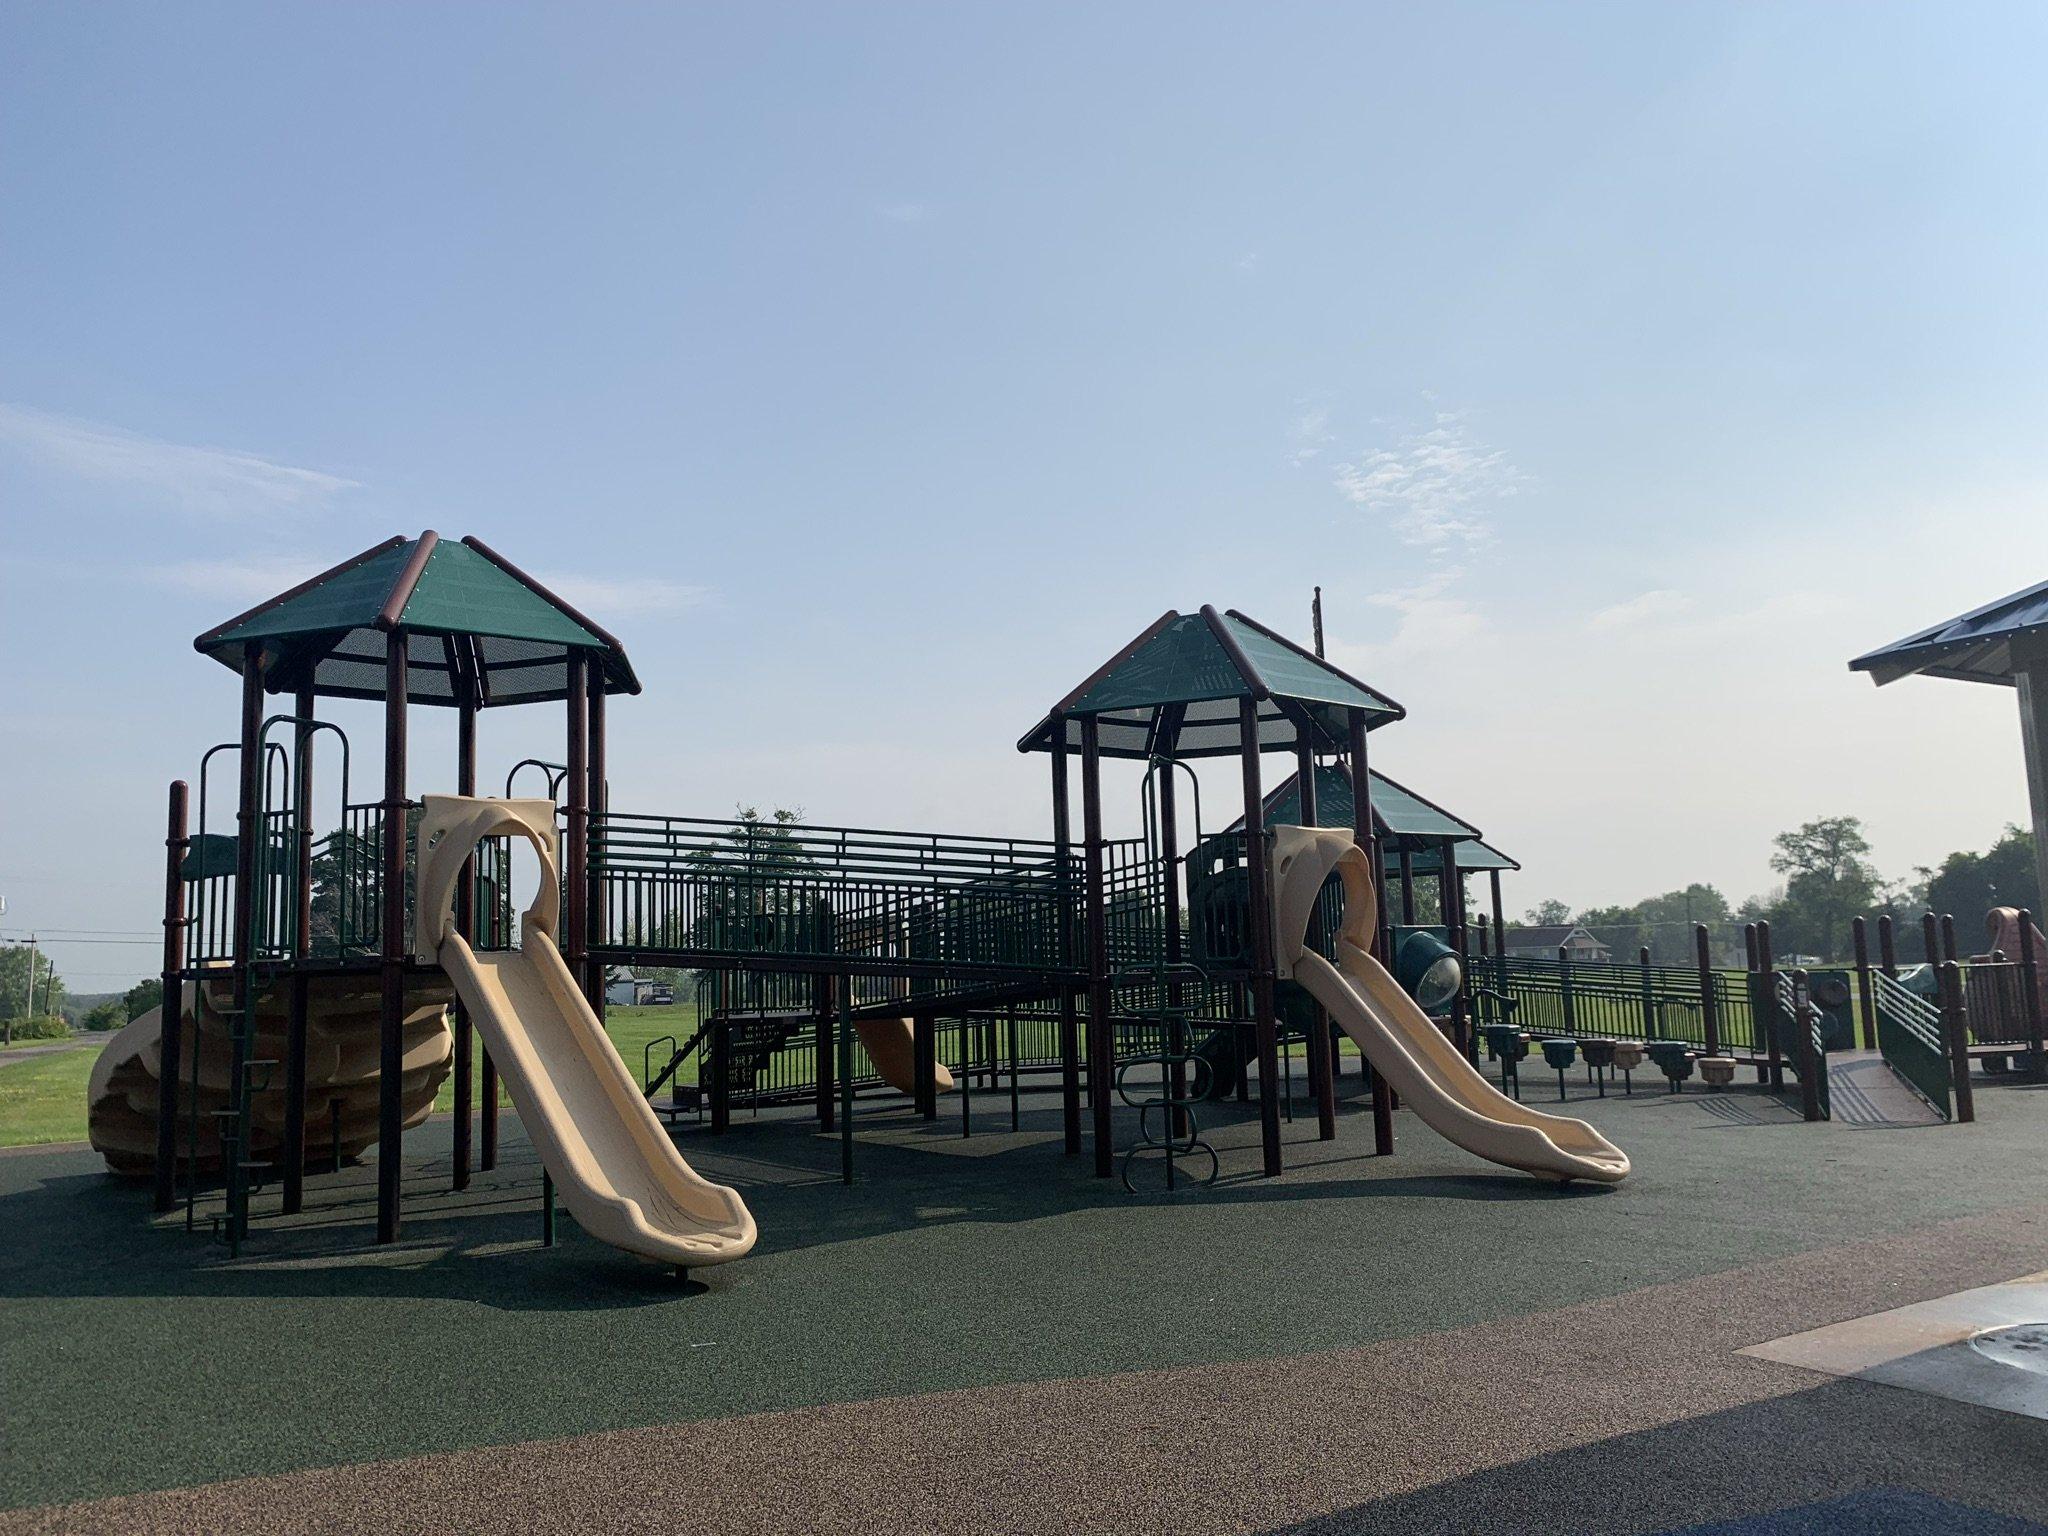 Playground Closed on Weekdays